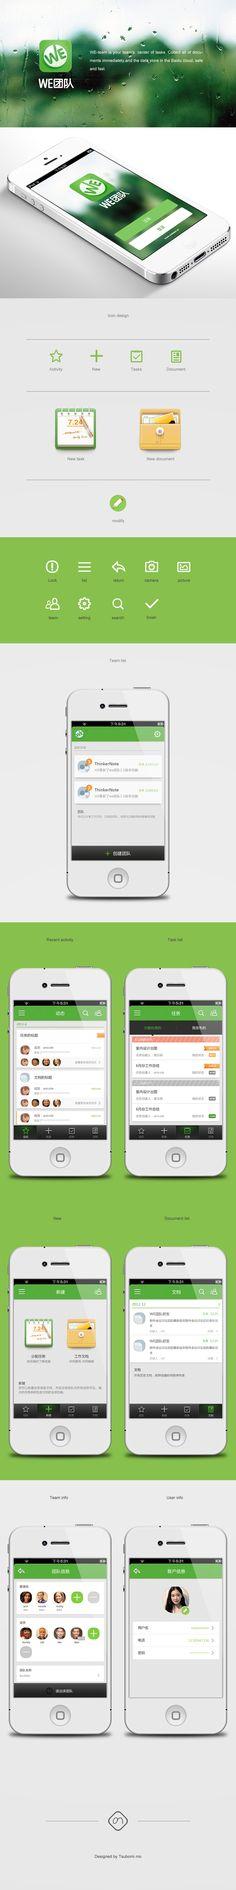 WE-team UI UX